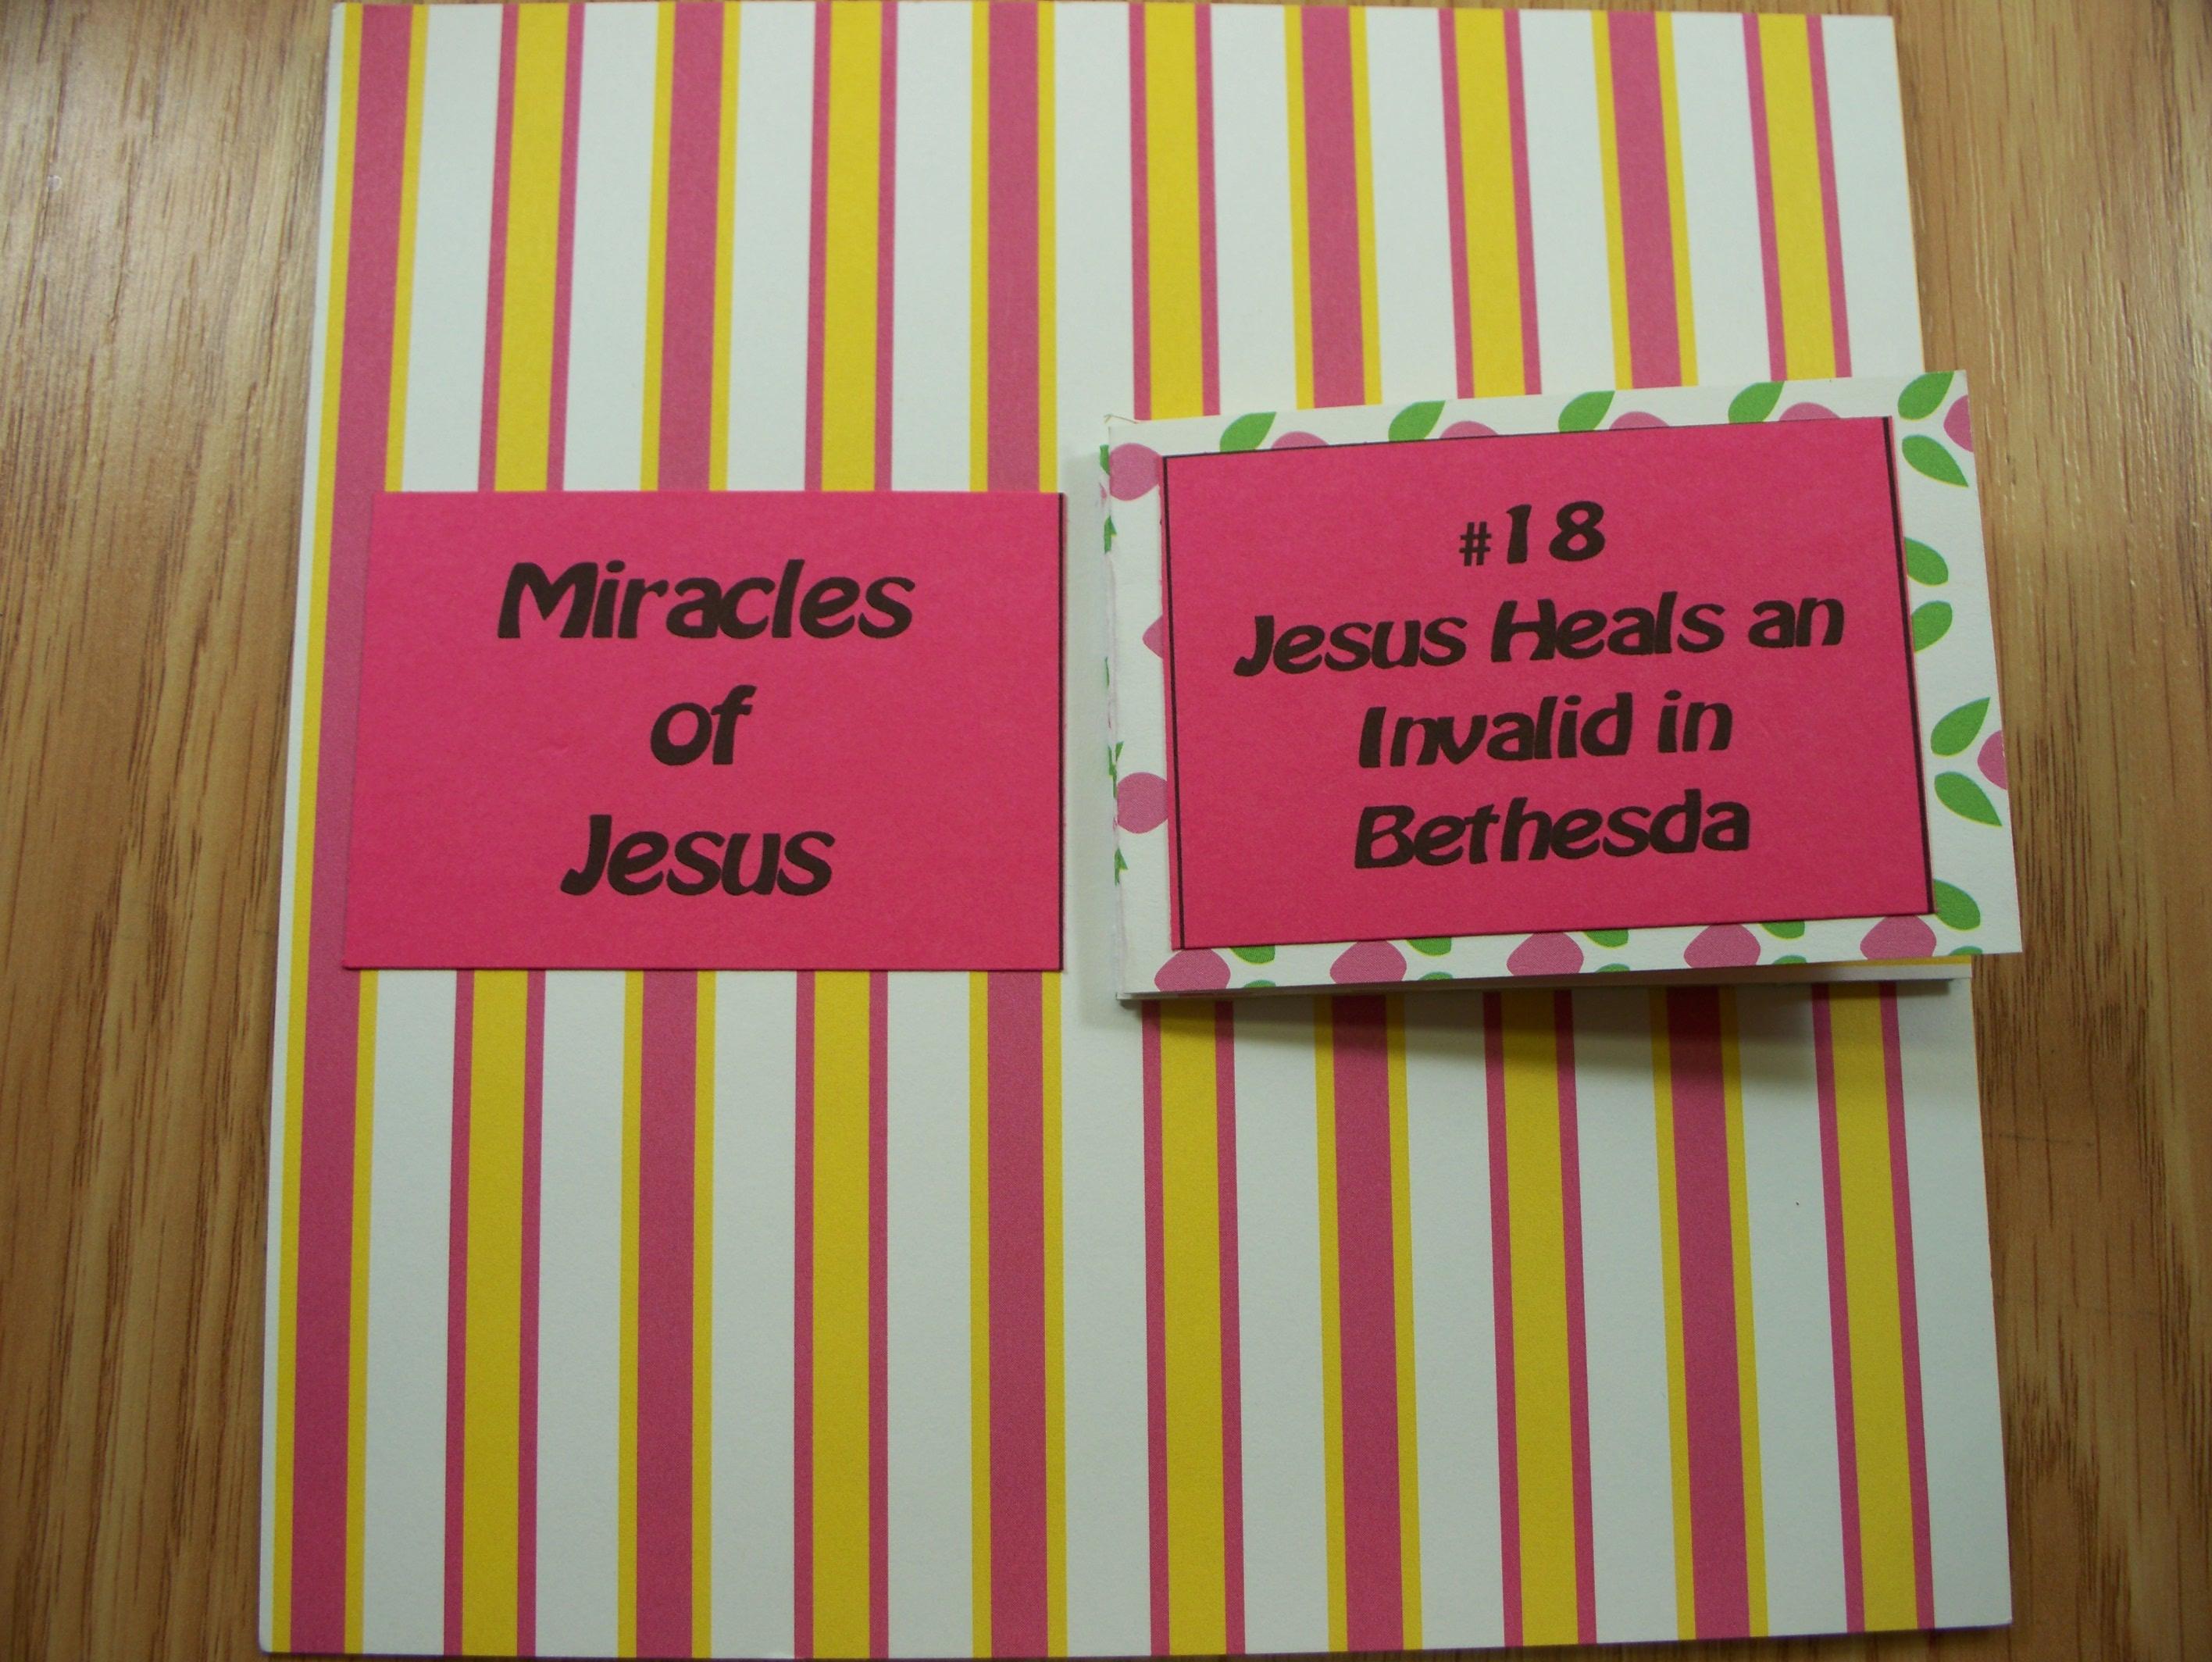 #18 Jesus Heals An Invalid In Bethesda